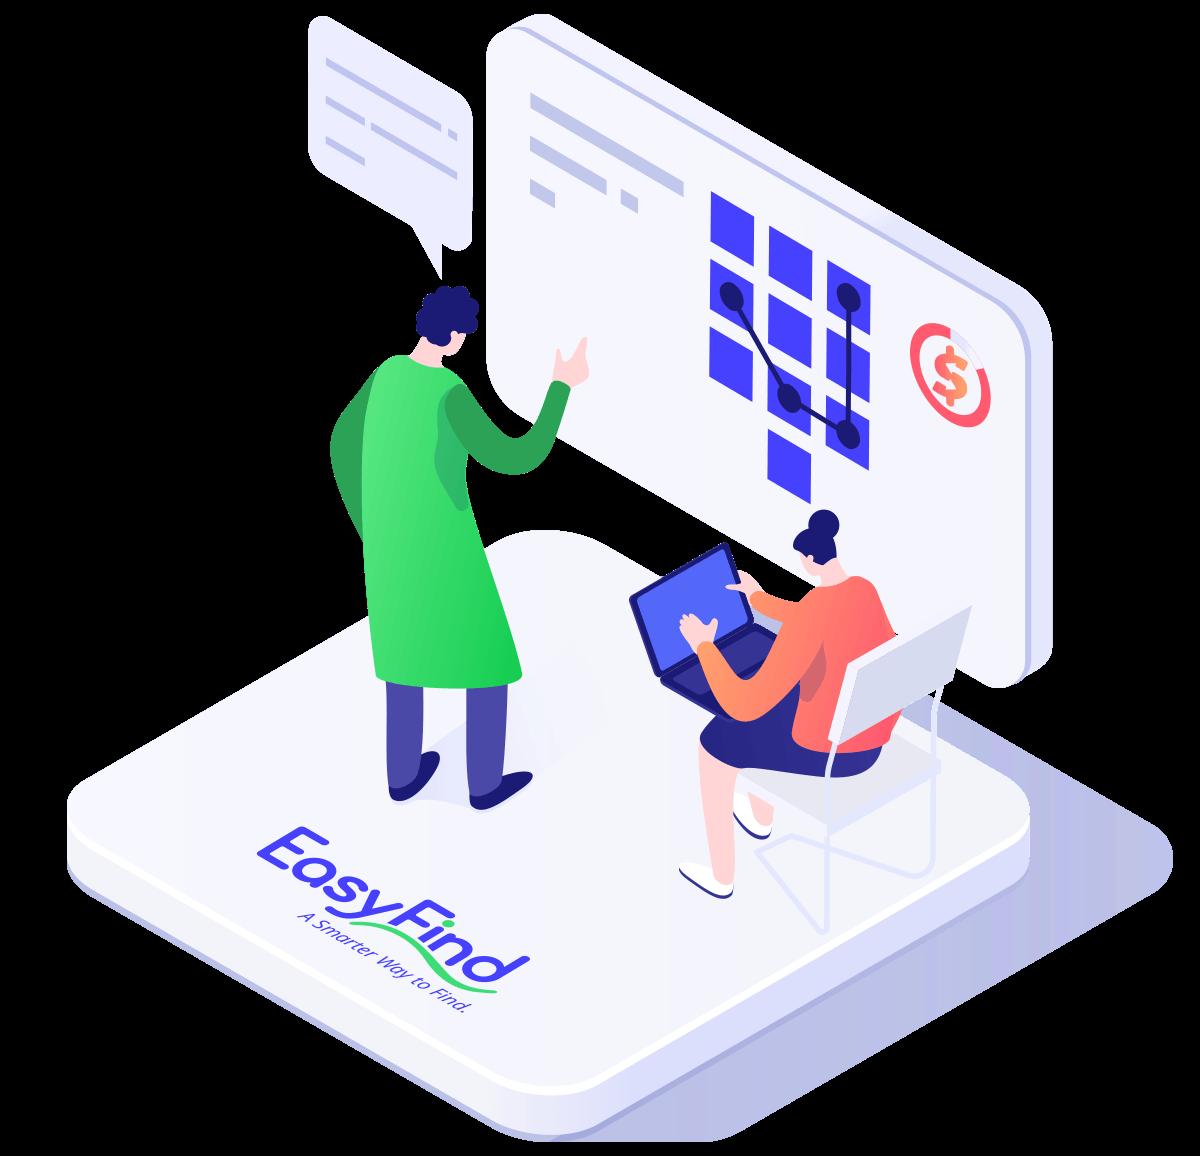 EasyFind Singapore Fintech Loans Platform